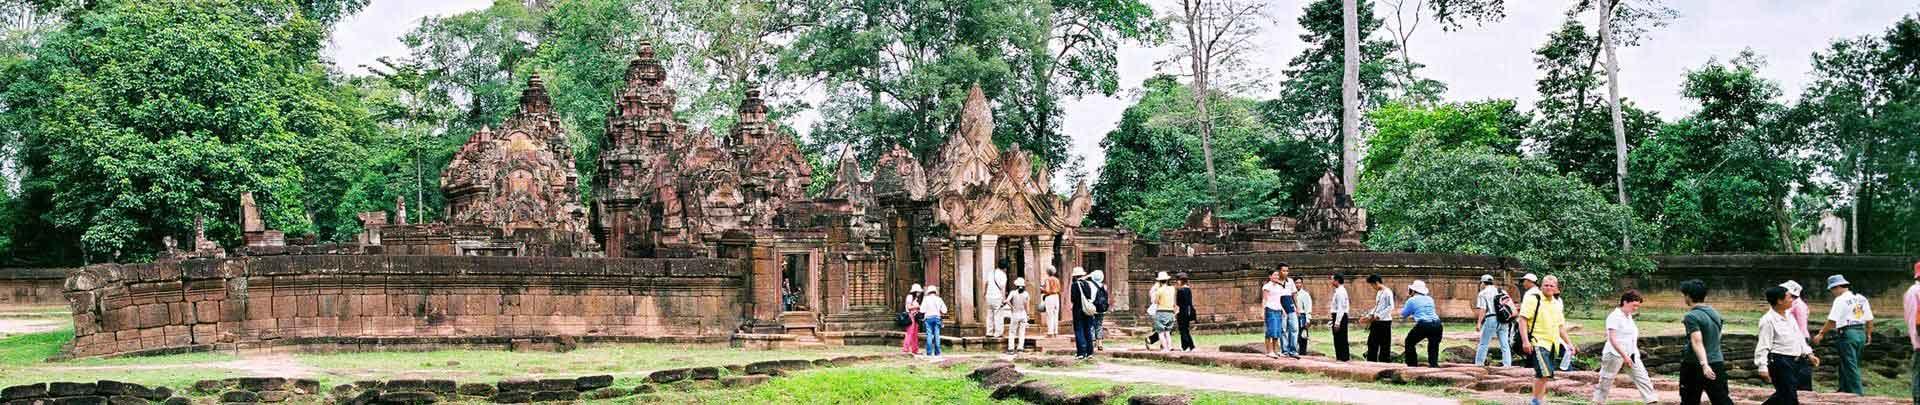 Visit Magical Temple of Angkor Wat